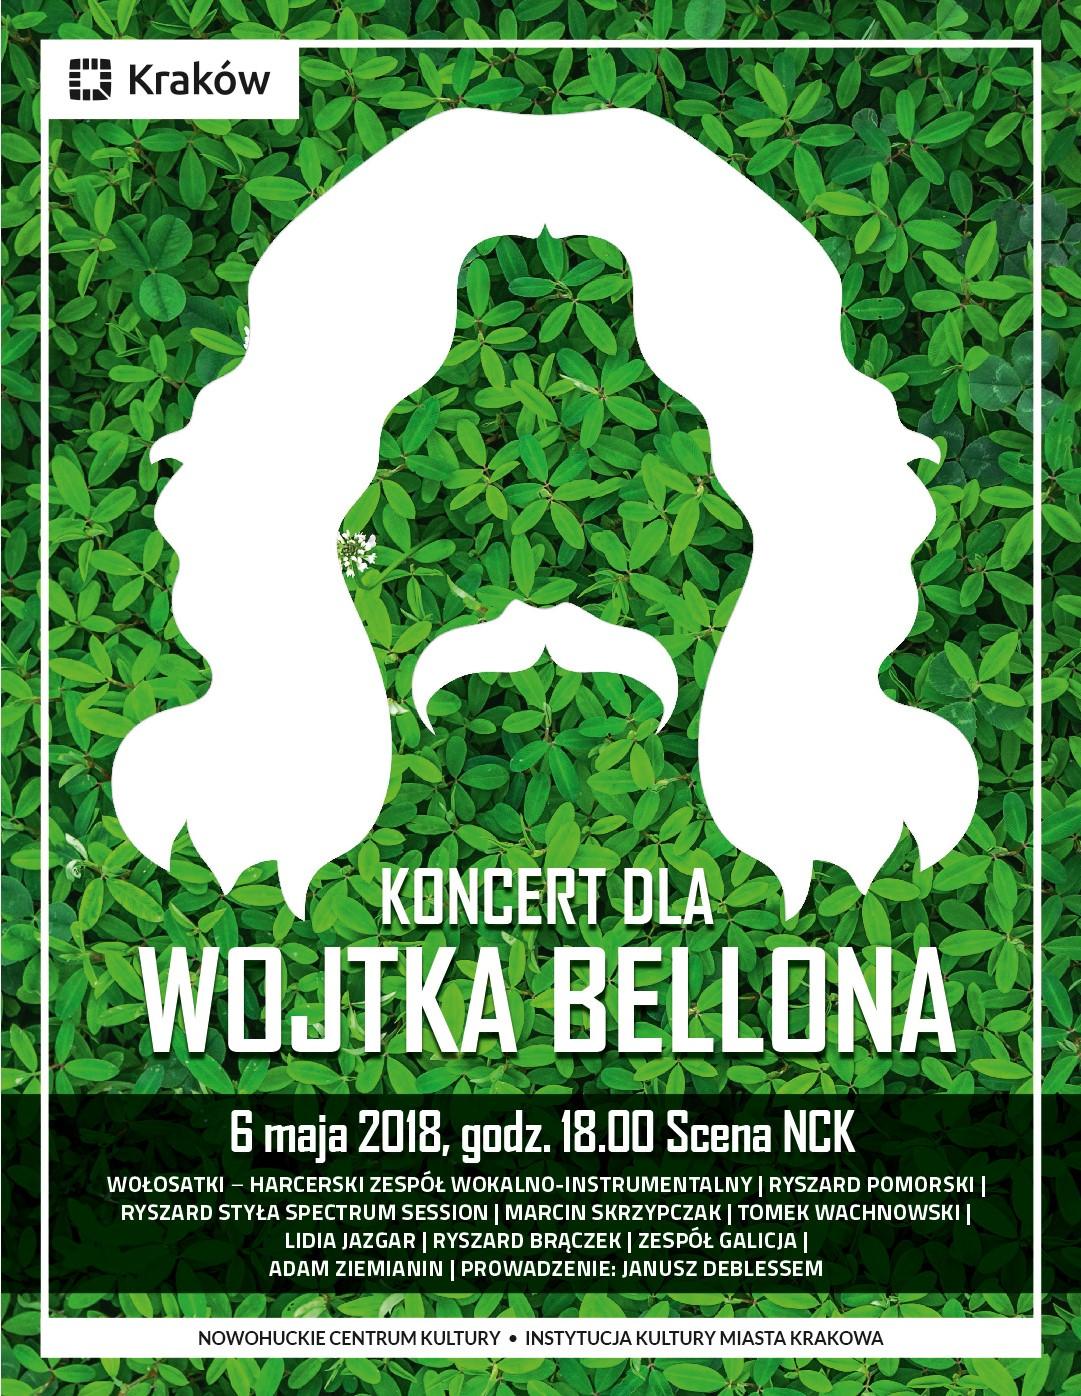 """Koncert dla Wojtka Bellona"" – plakat (źródło: materiały prasowe organizatora)"